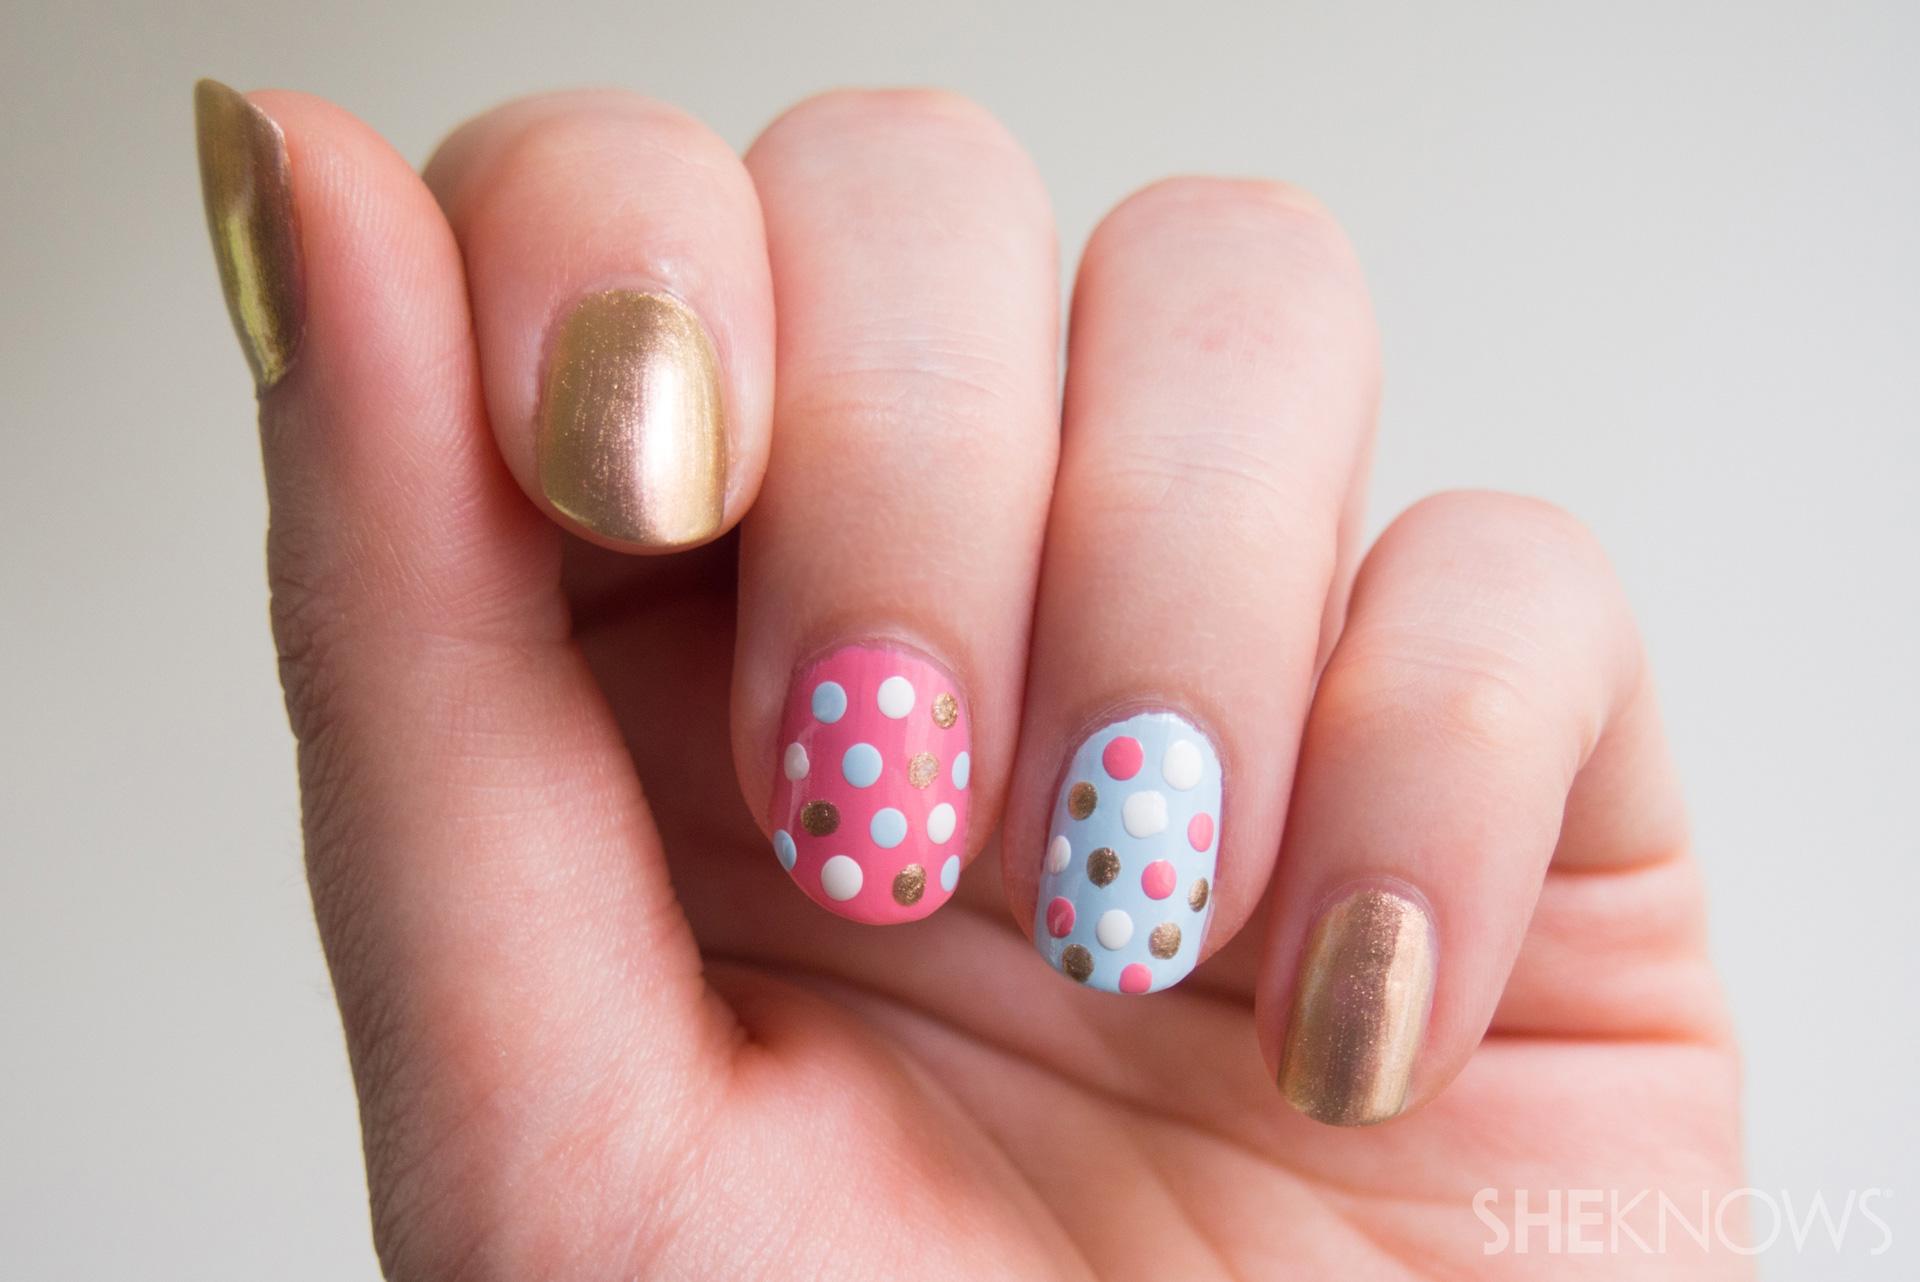 Finished polka dot nails